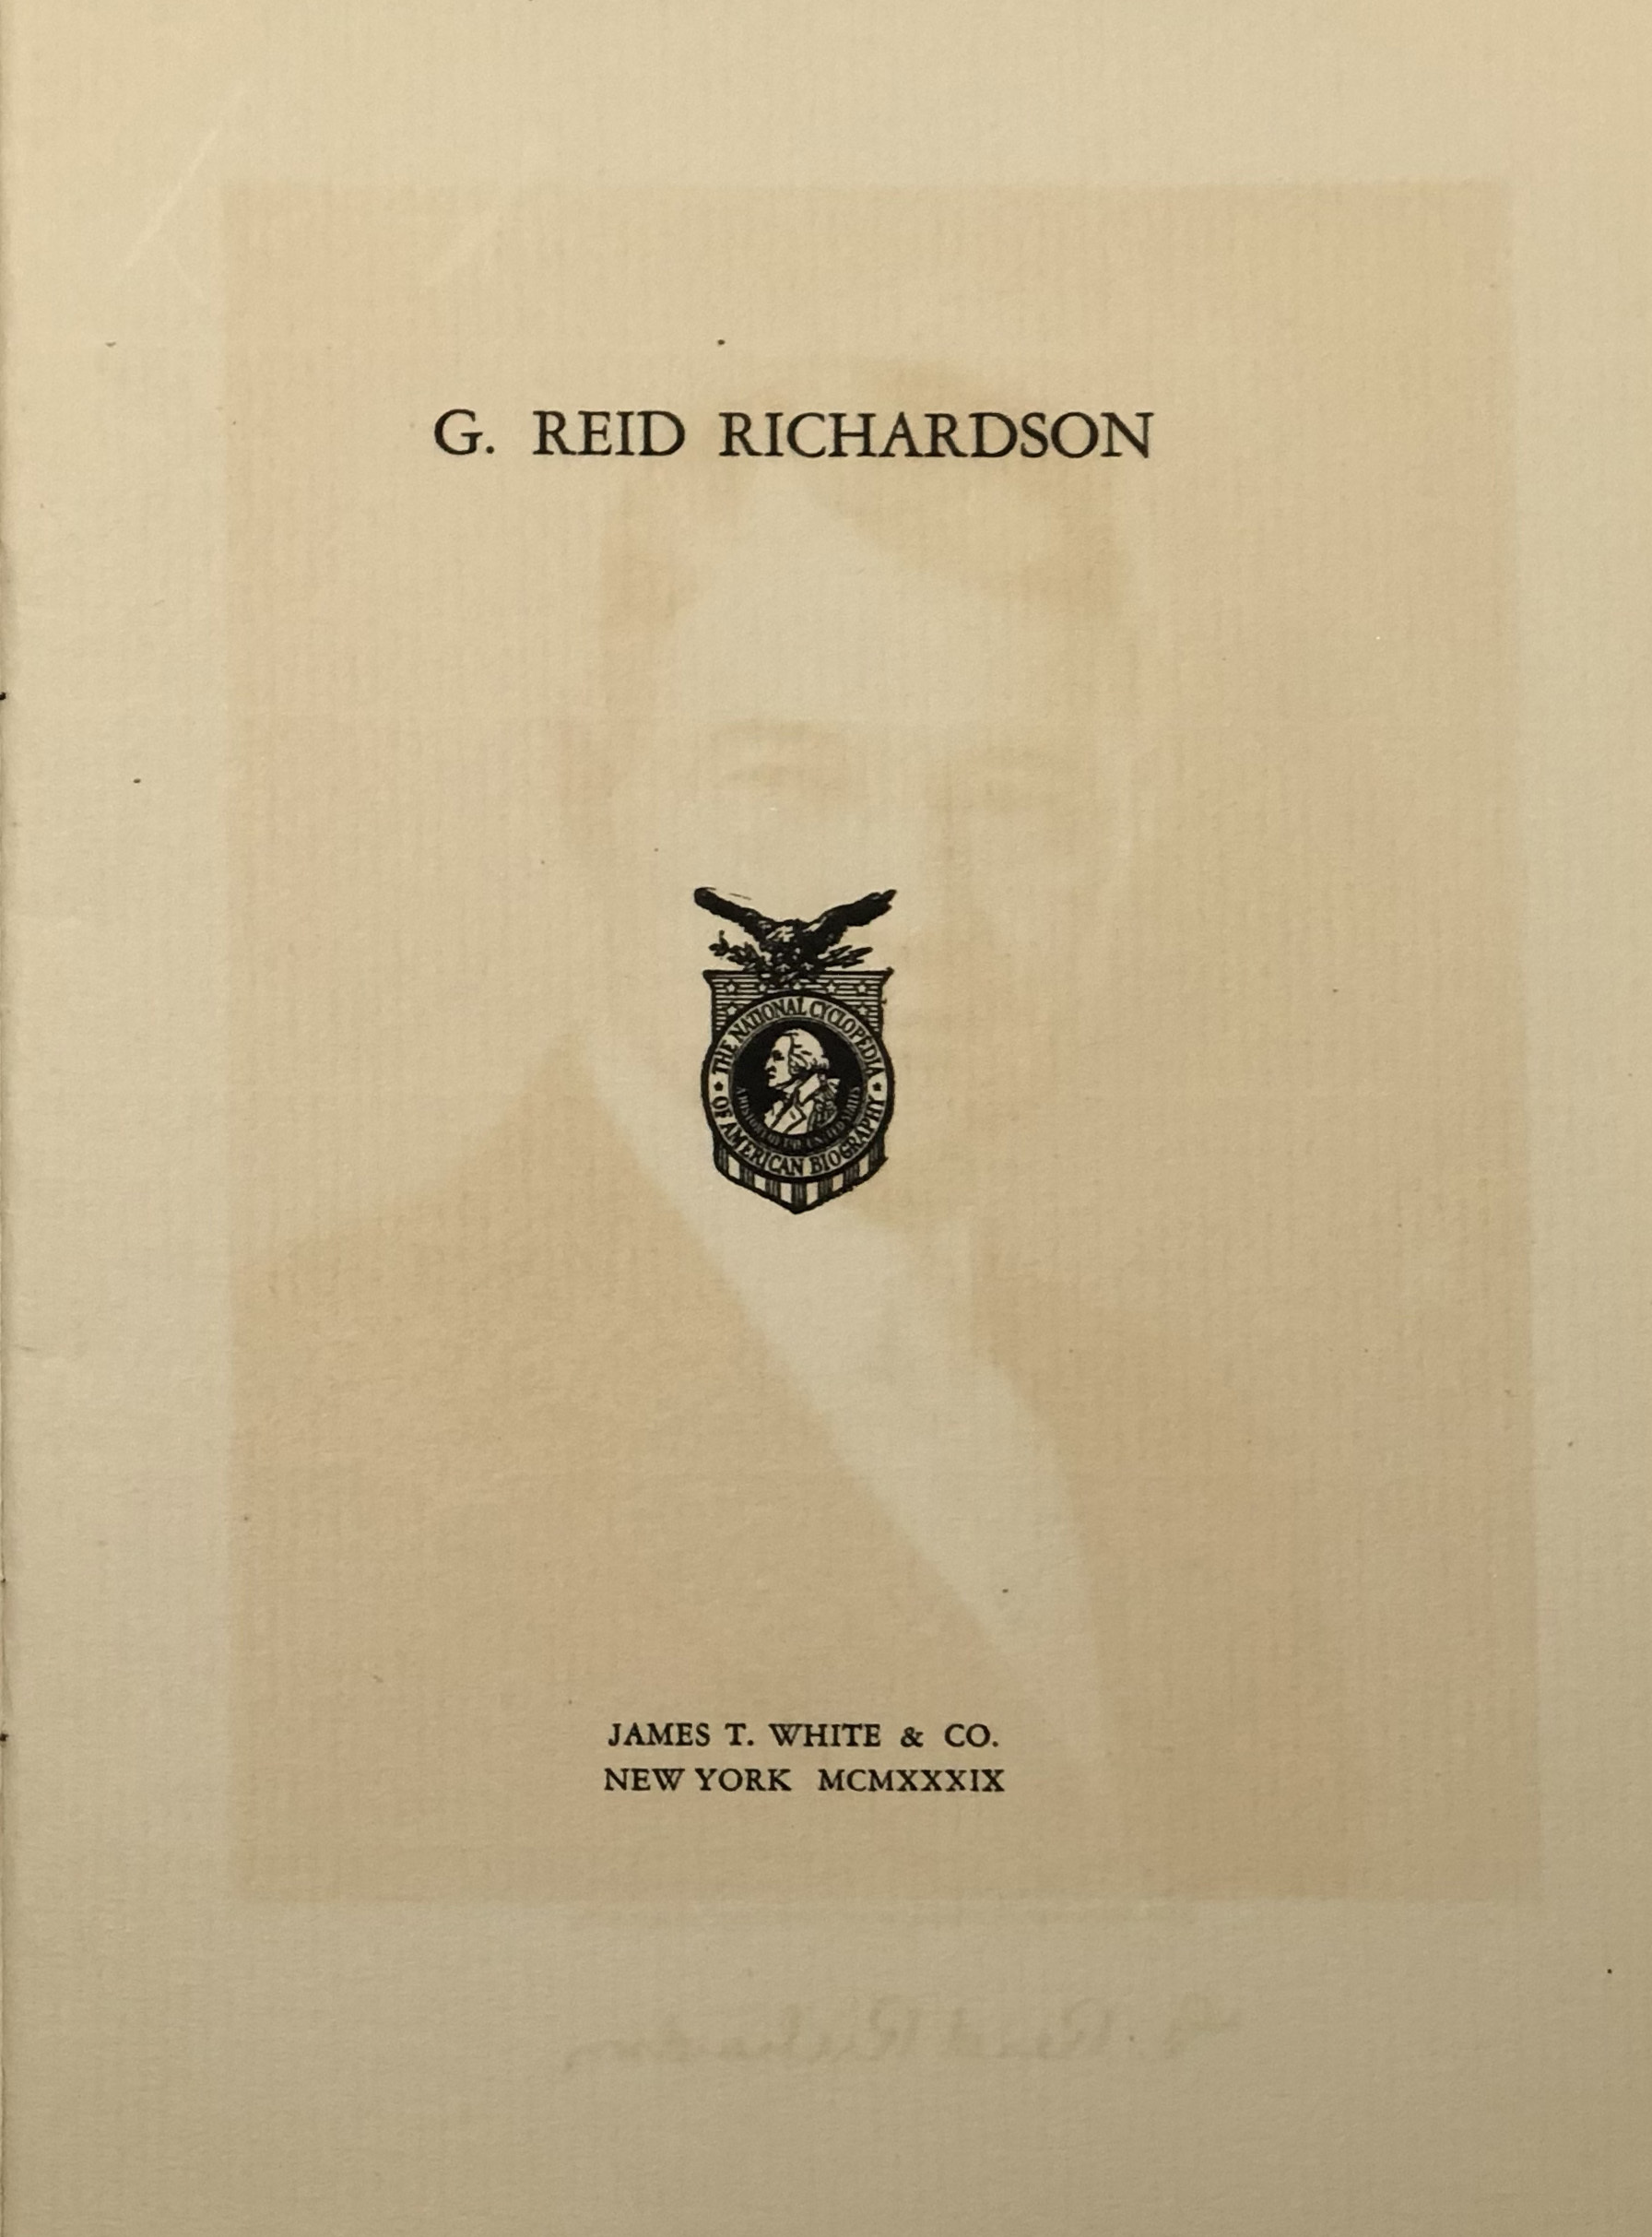 G Reid Richardson, biographical pamphlet, title page.jpg